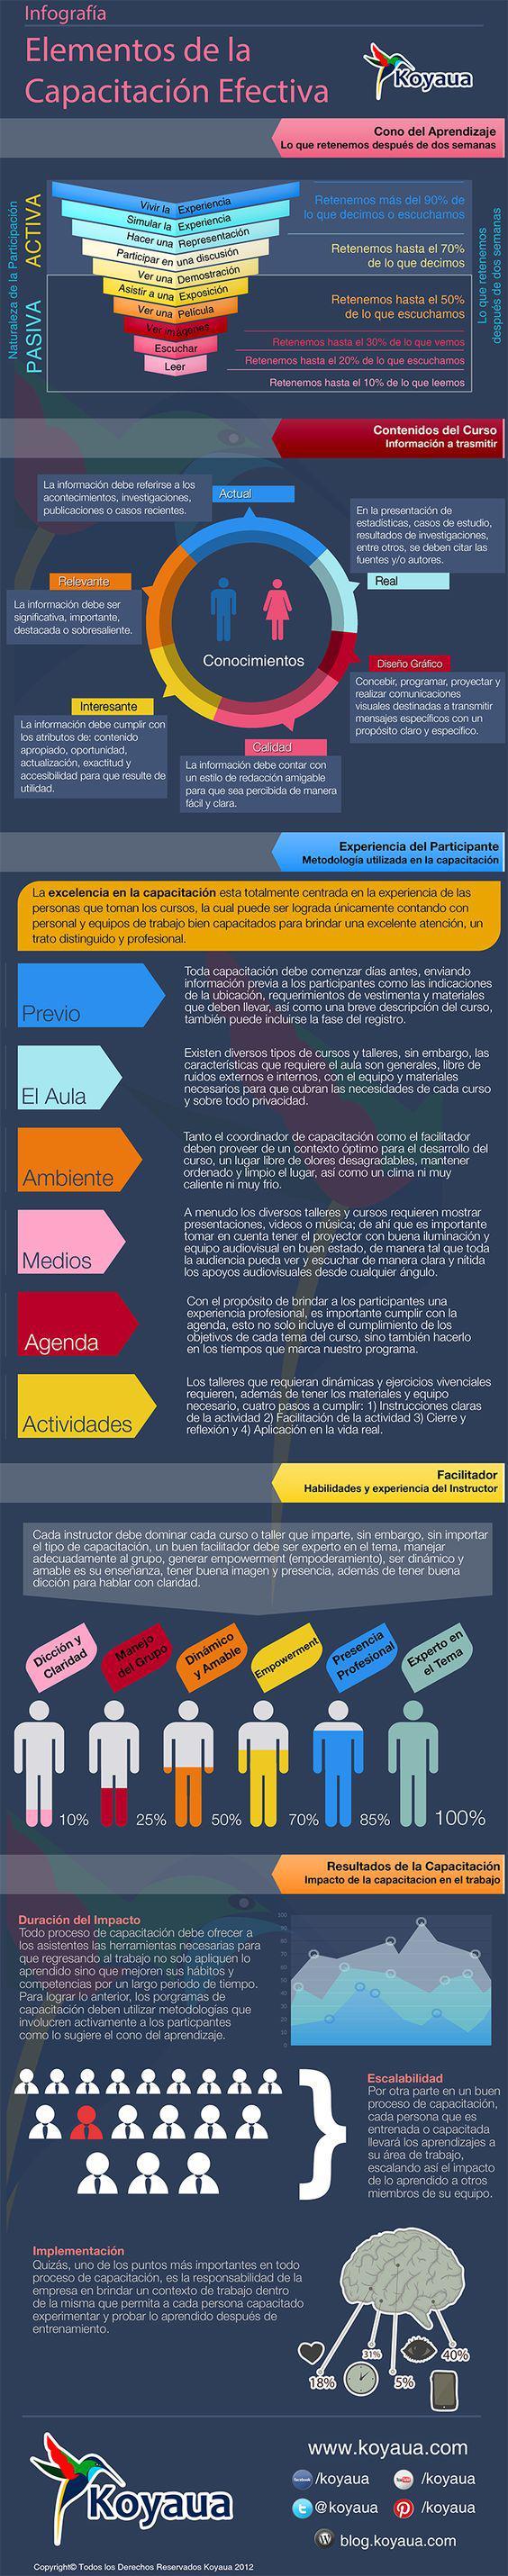 elementosprogramacapacitacionefectiva-infografia-bloggesvin